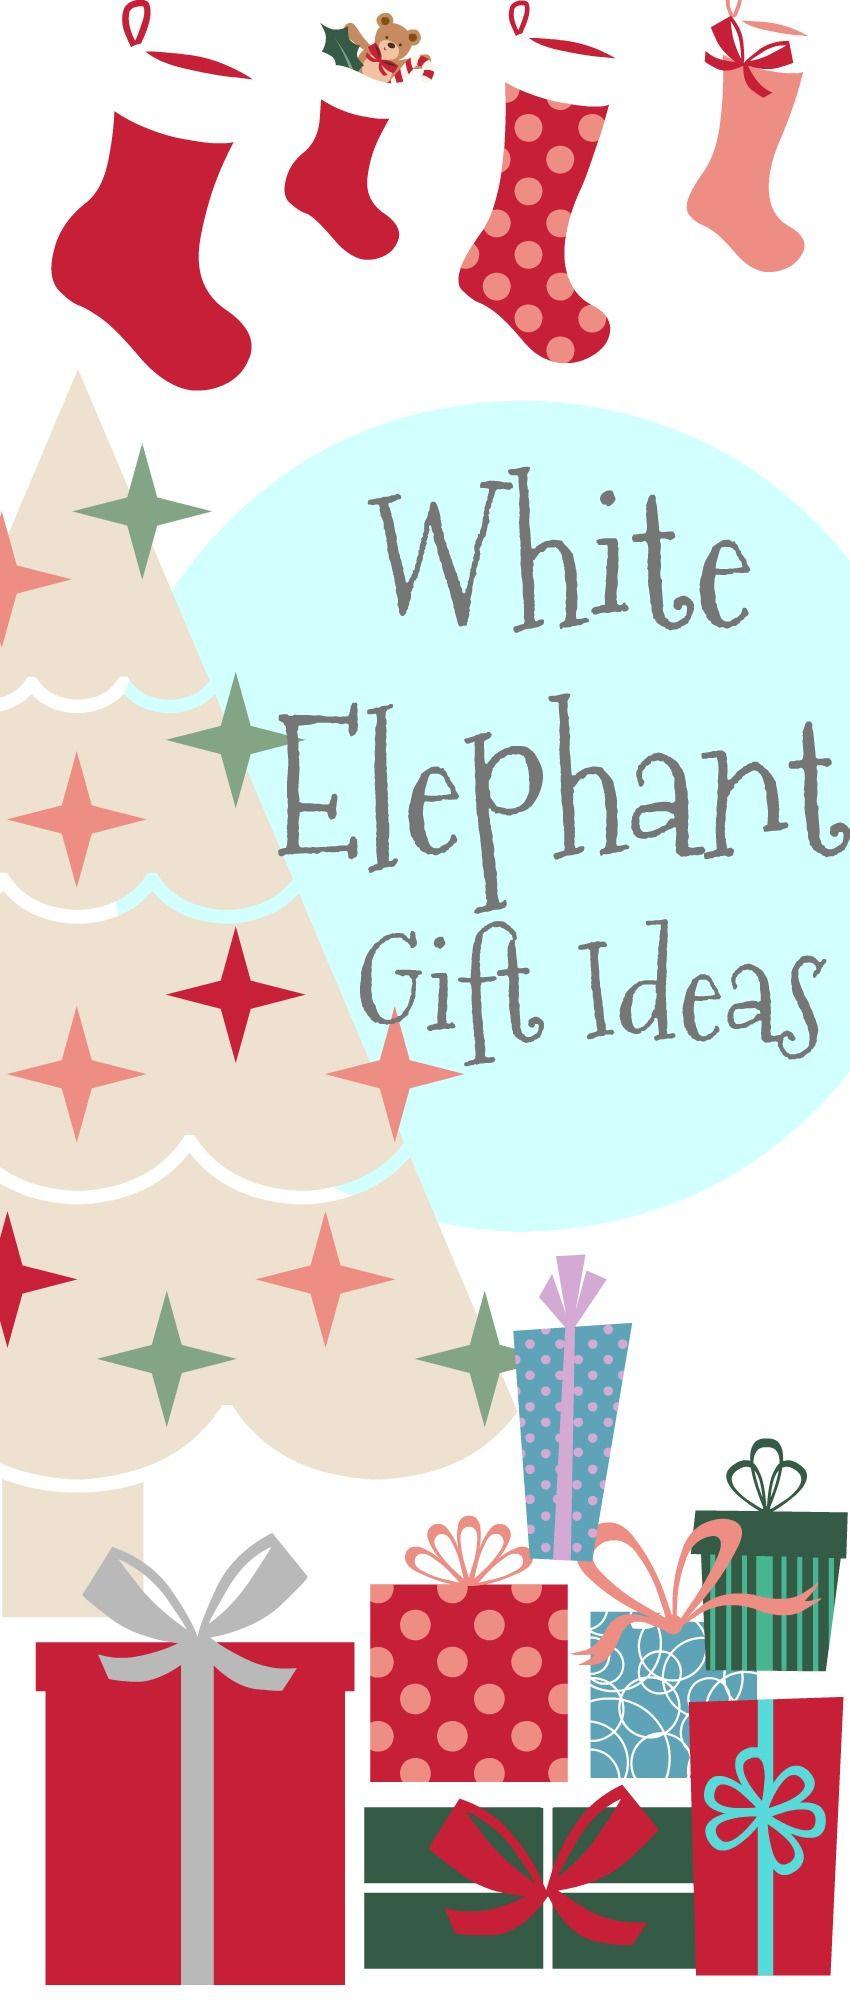 White Elephant Gift Ideas   Christmas   Pinterest